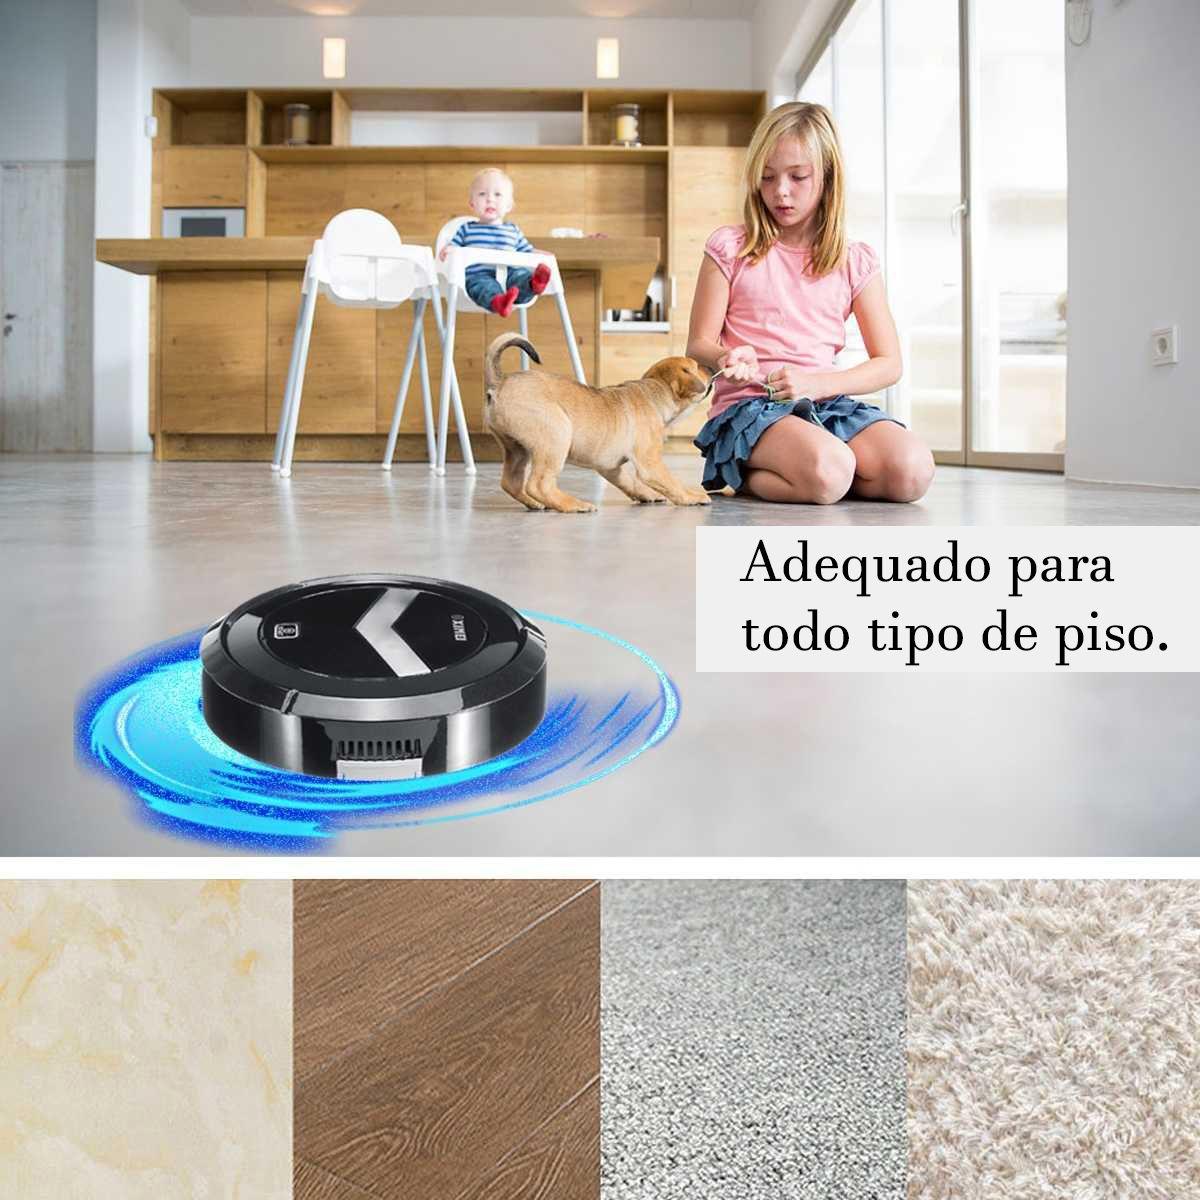 Robo Limpa Casa Sensor Automatico Varre Vassoura Aspirador de Po